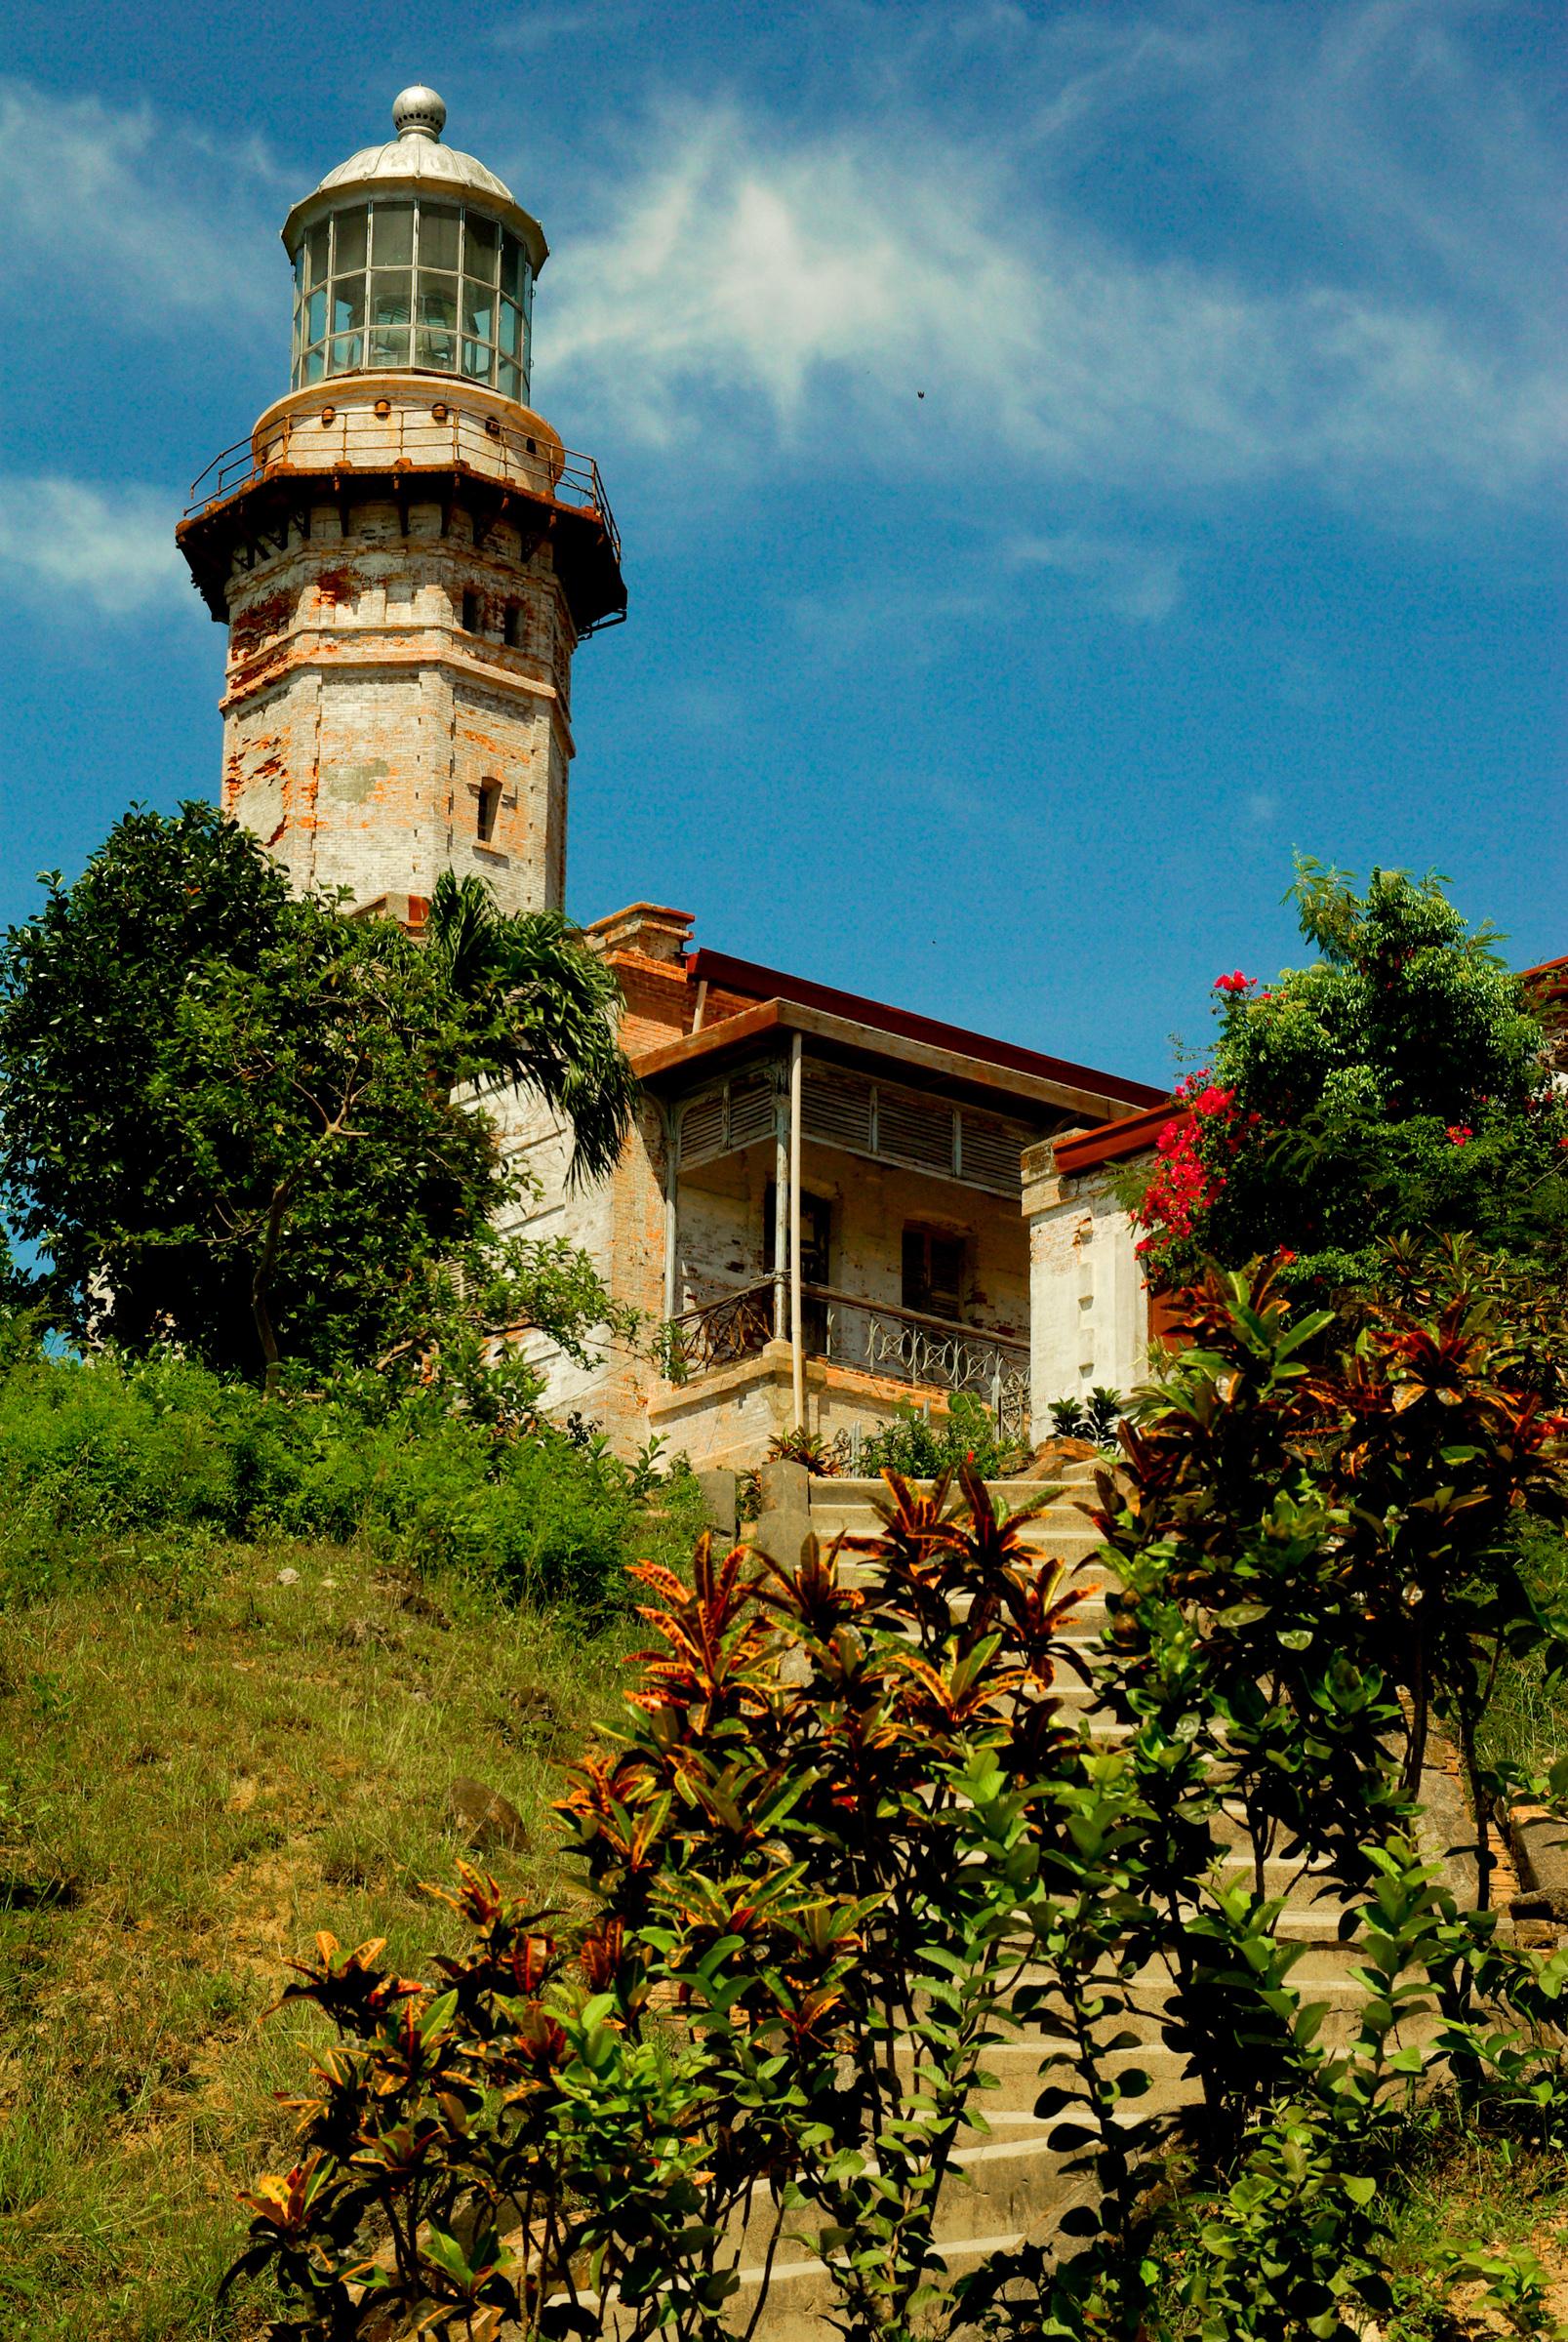 Lighthouse,burgos,ilocos